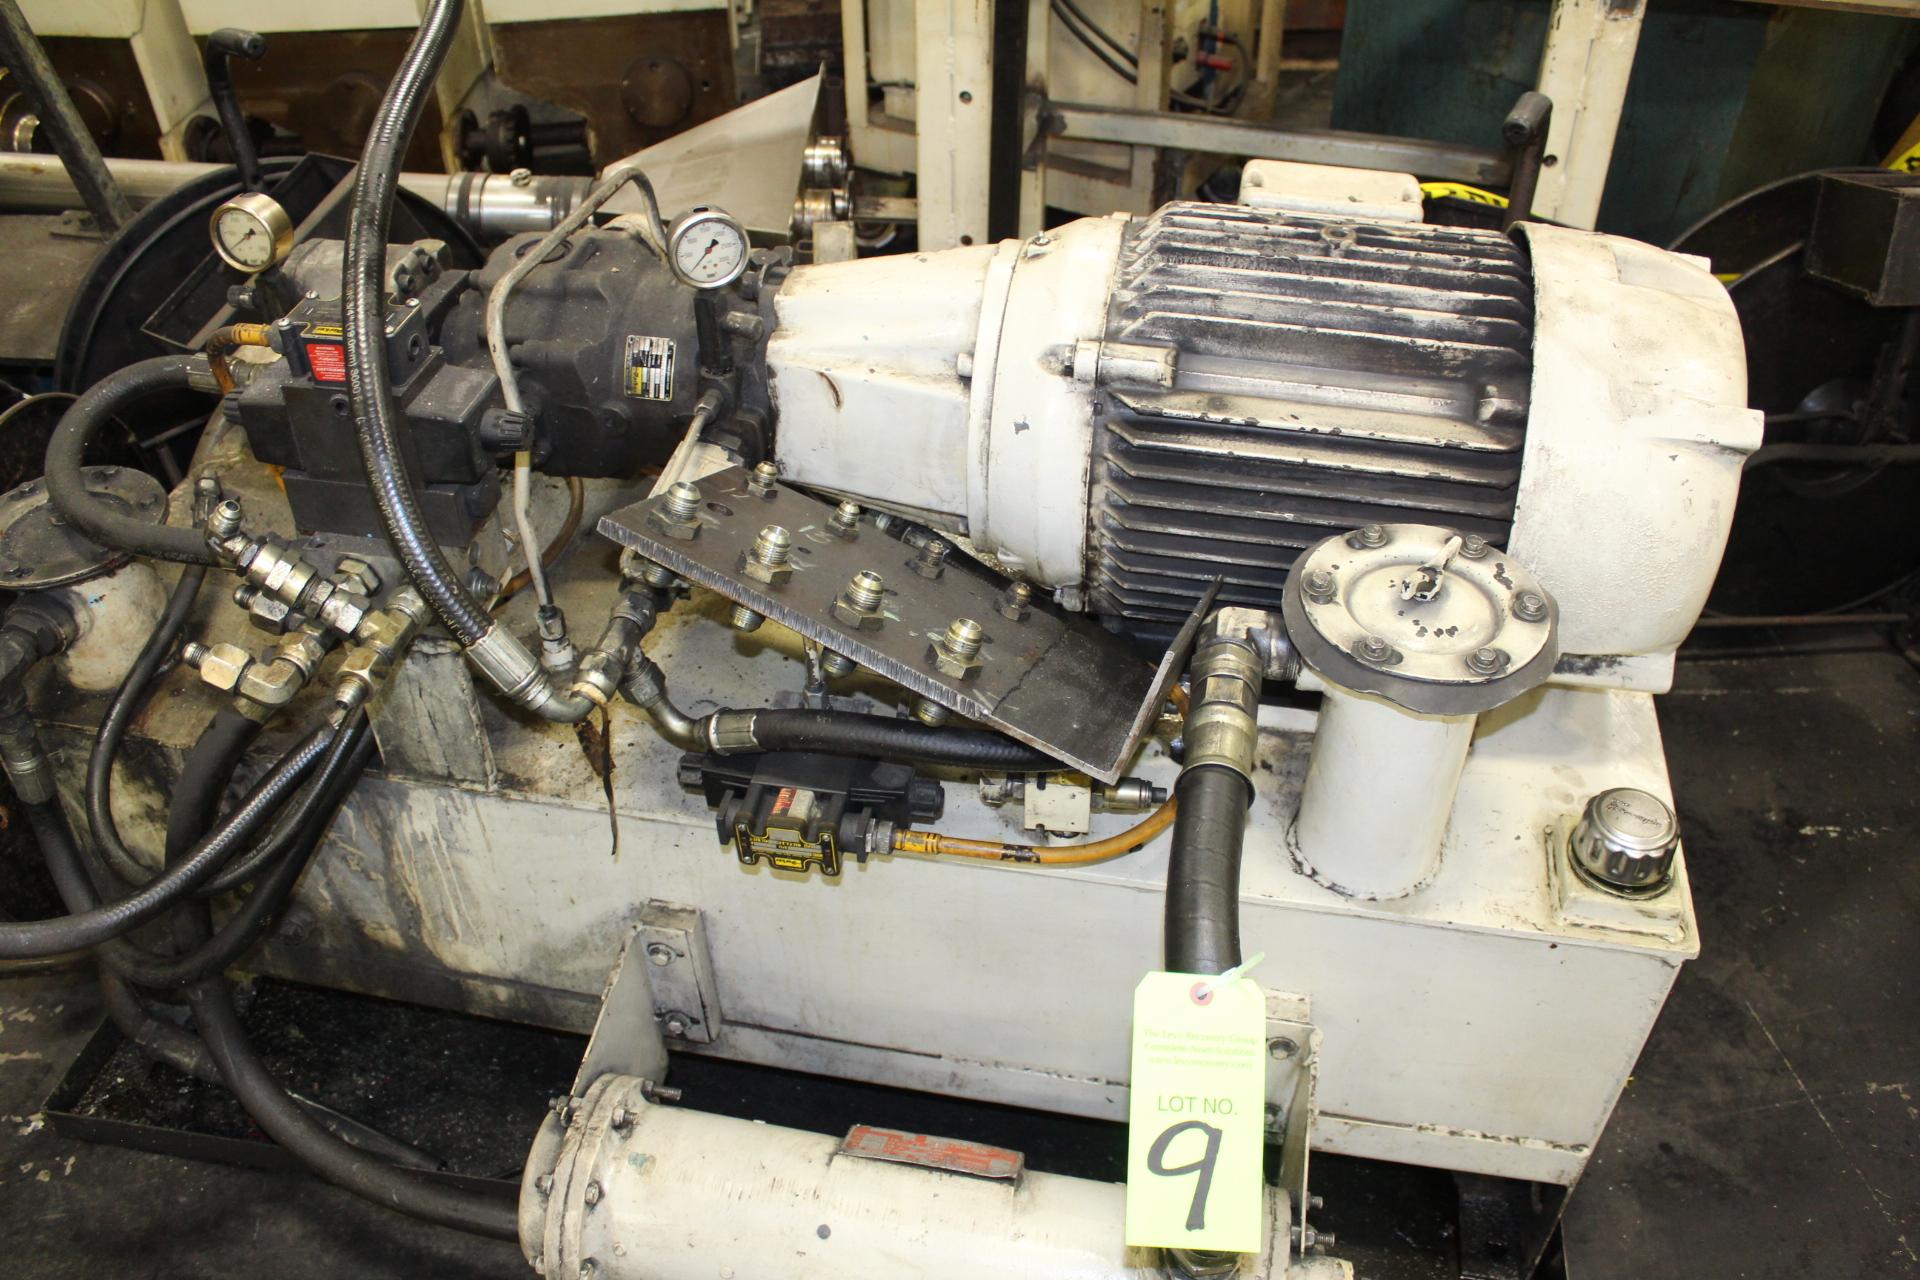 Lot 9 - Estimated 40-Hp Hydraulic Power Unit - Angola, Indiana